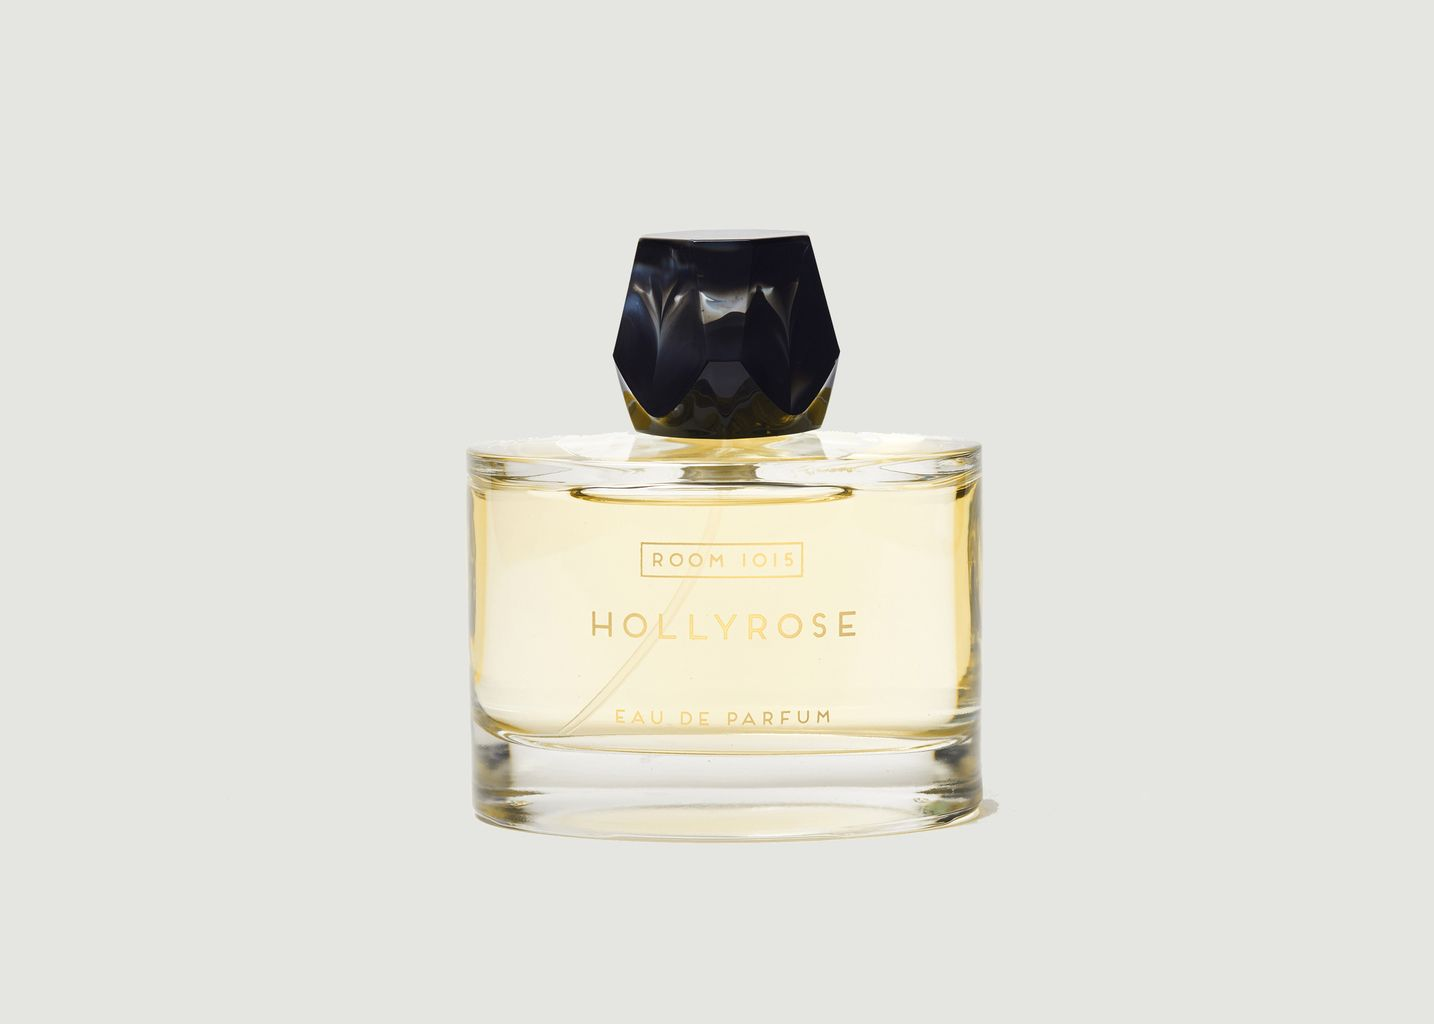 Parfum Hollyrose - Room 1015